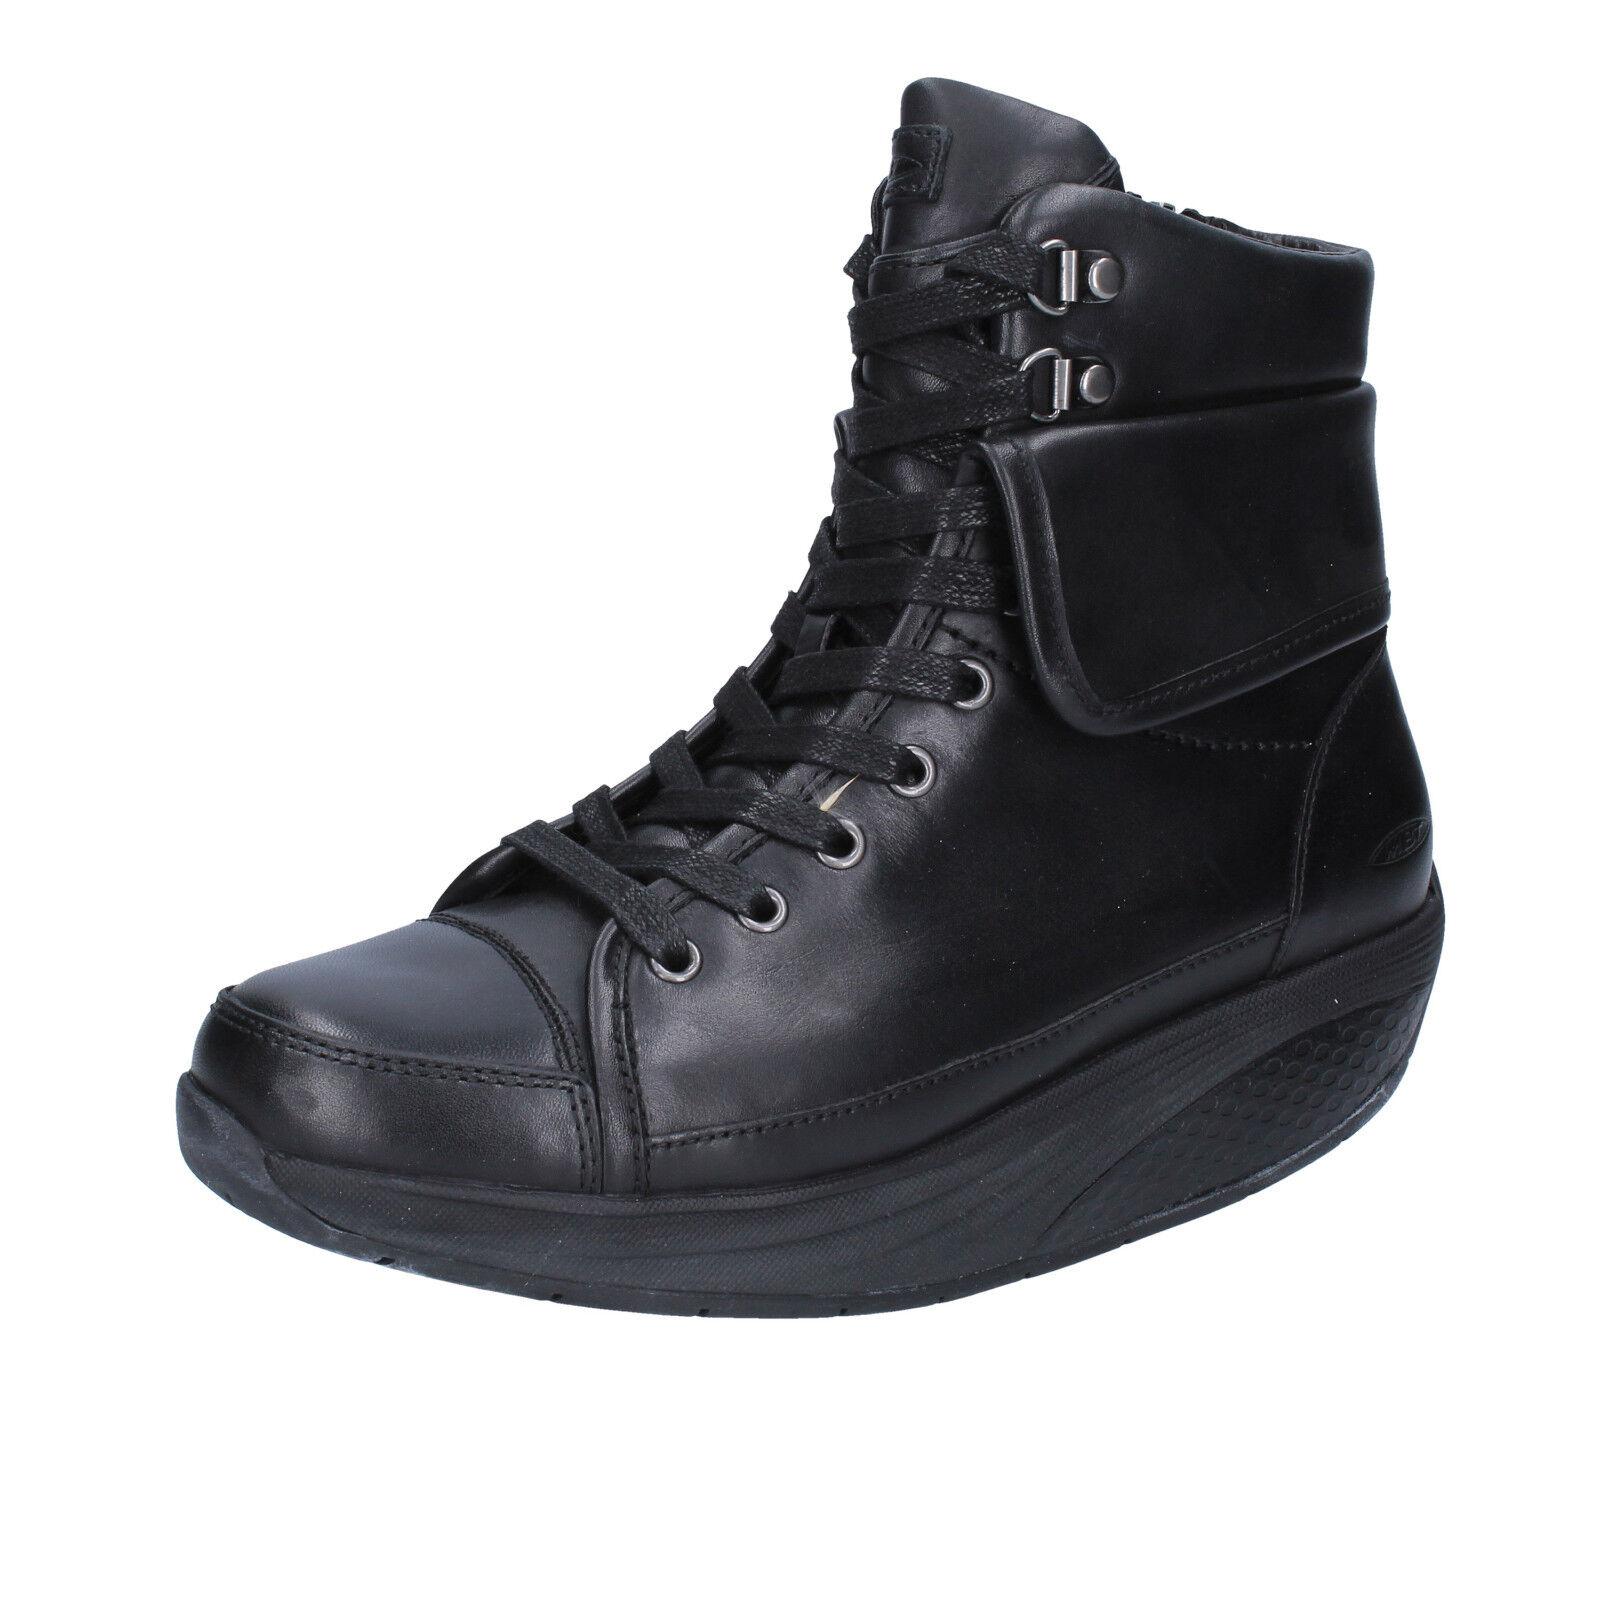 Chaussures femmes MBT 3 (UE 35) Bottines en cuir noir BT206-35